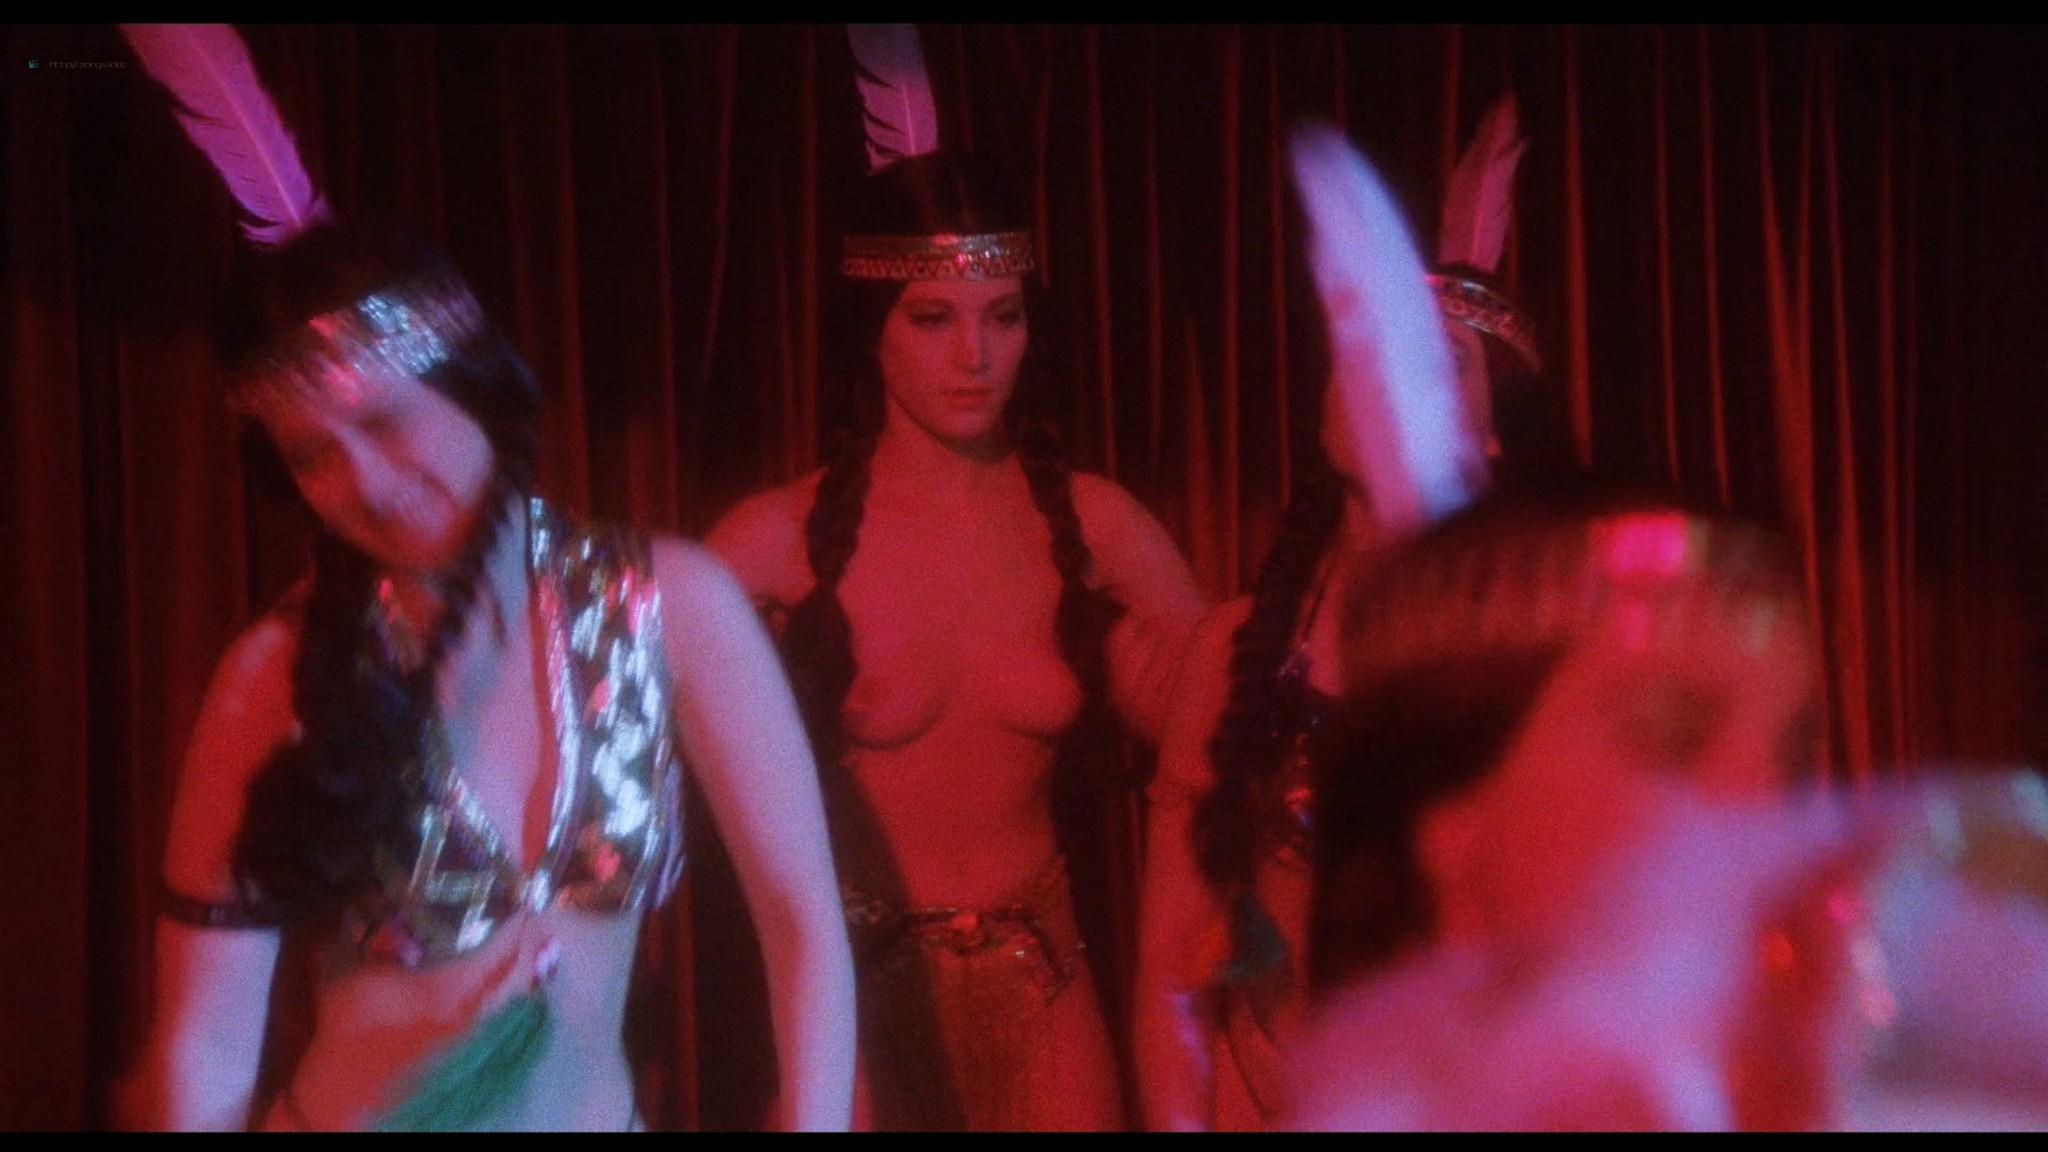 Bridget Fonda nude butt boobs Britt Ekland nude Joanne Whalley hot - Scandal (1989) HD 1080p BluRay (15)